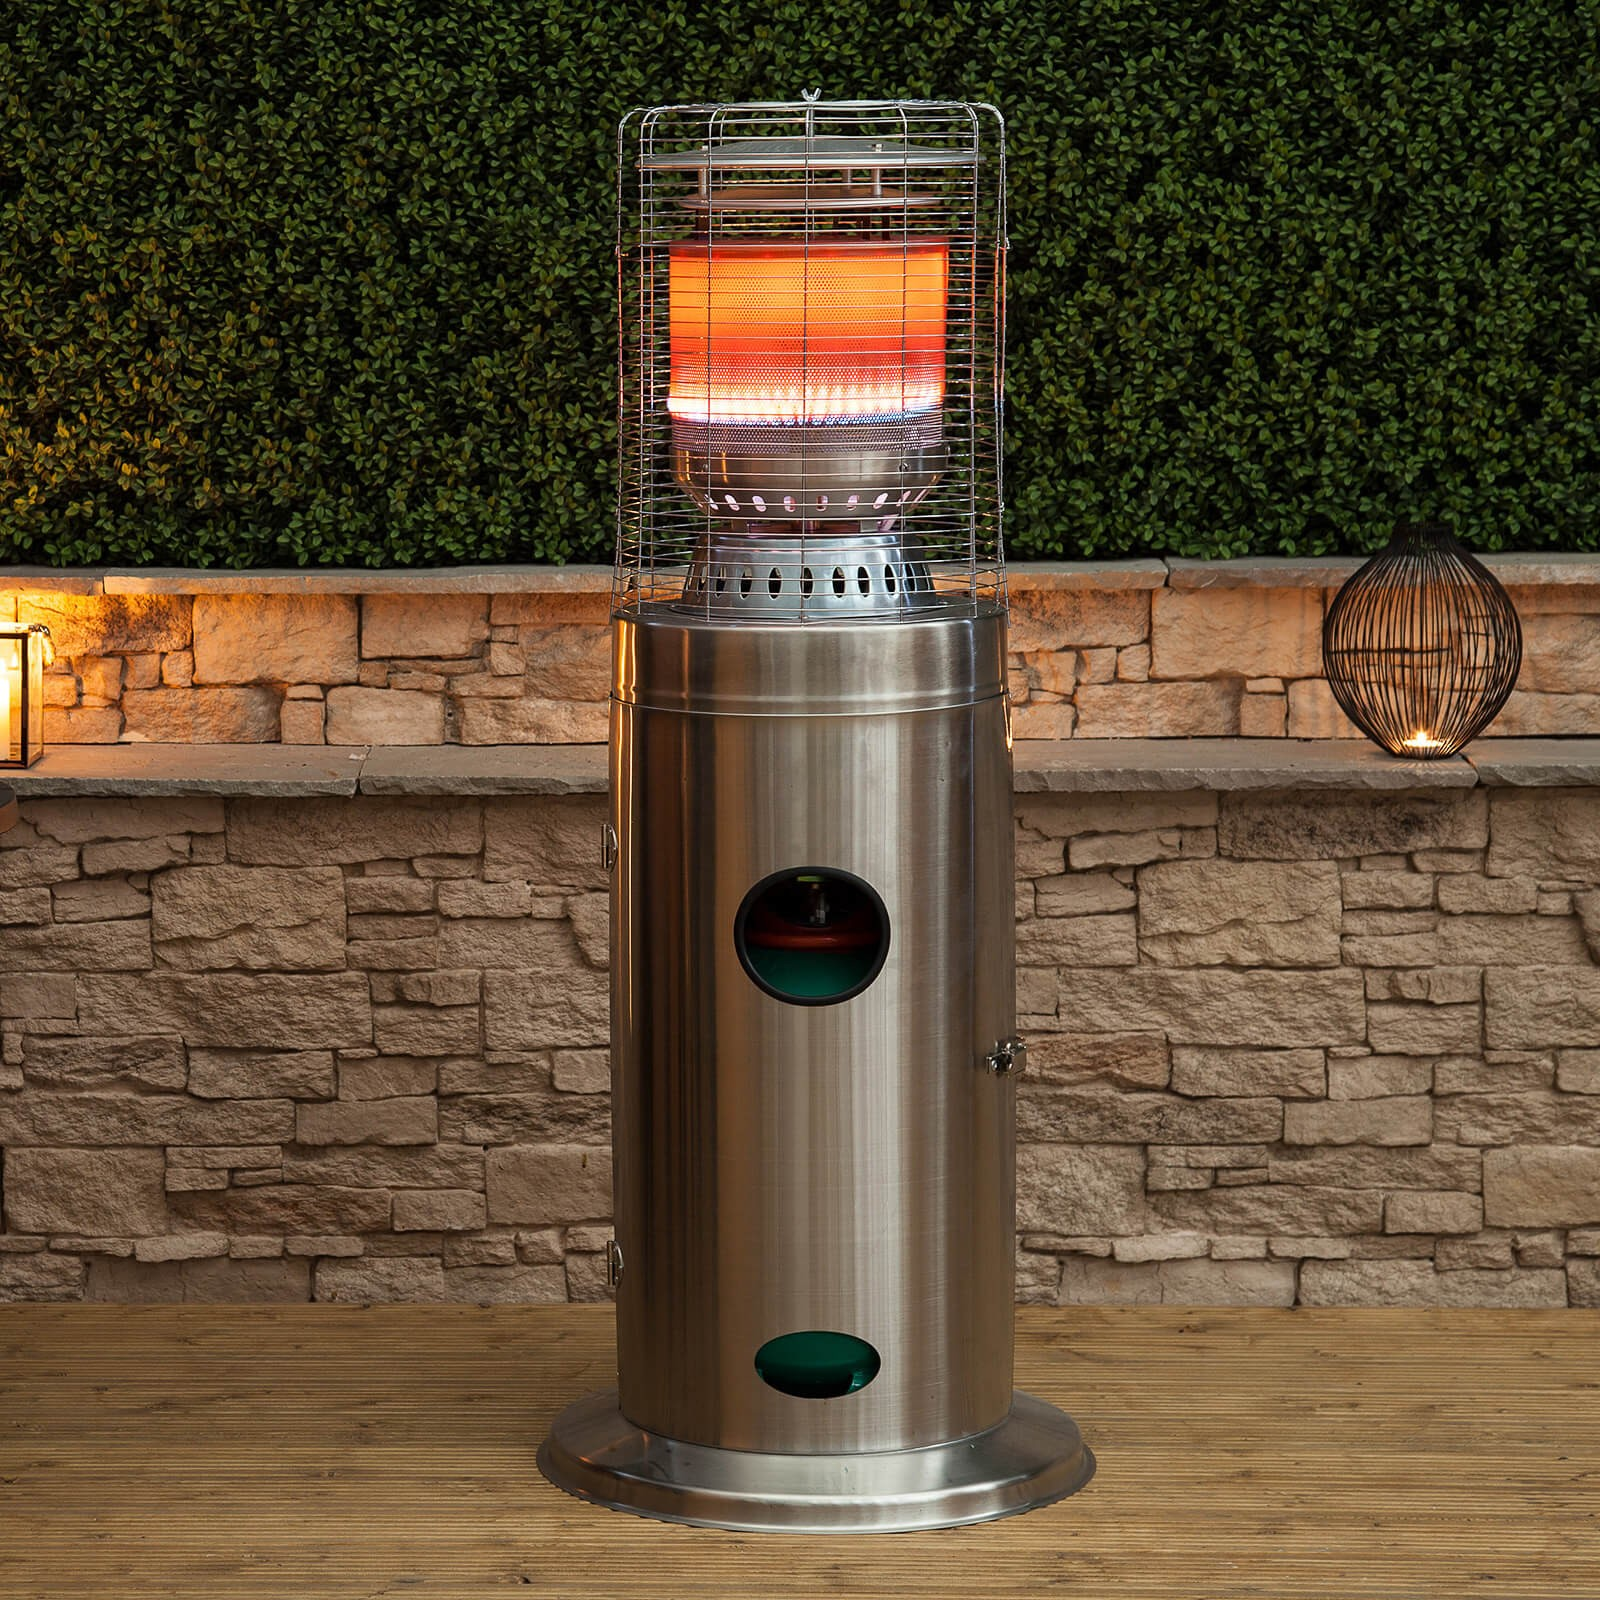 Best Tips to Buy Patio heaters